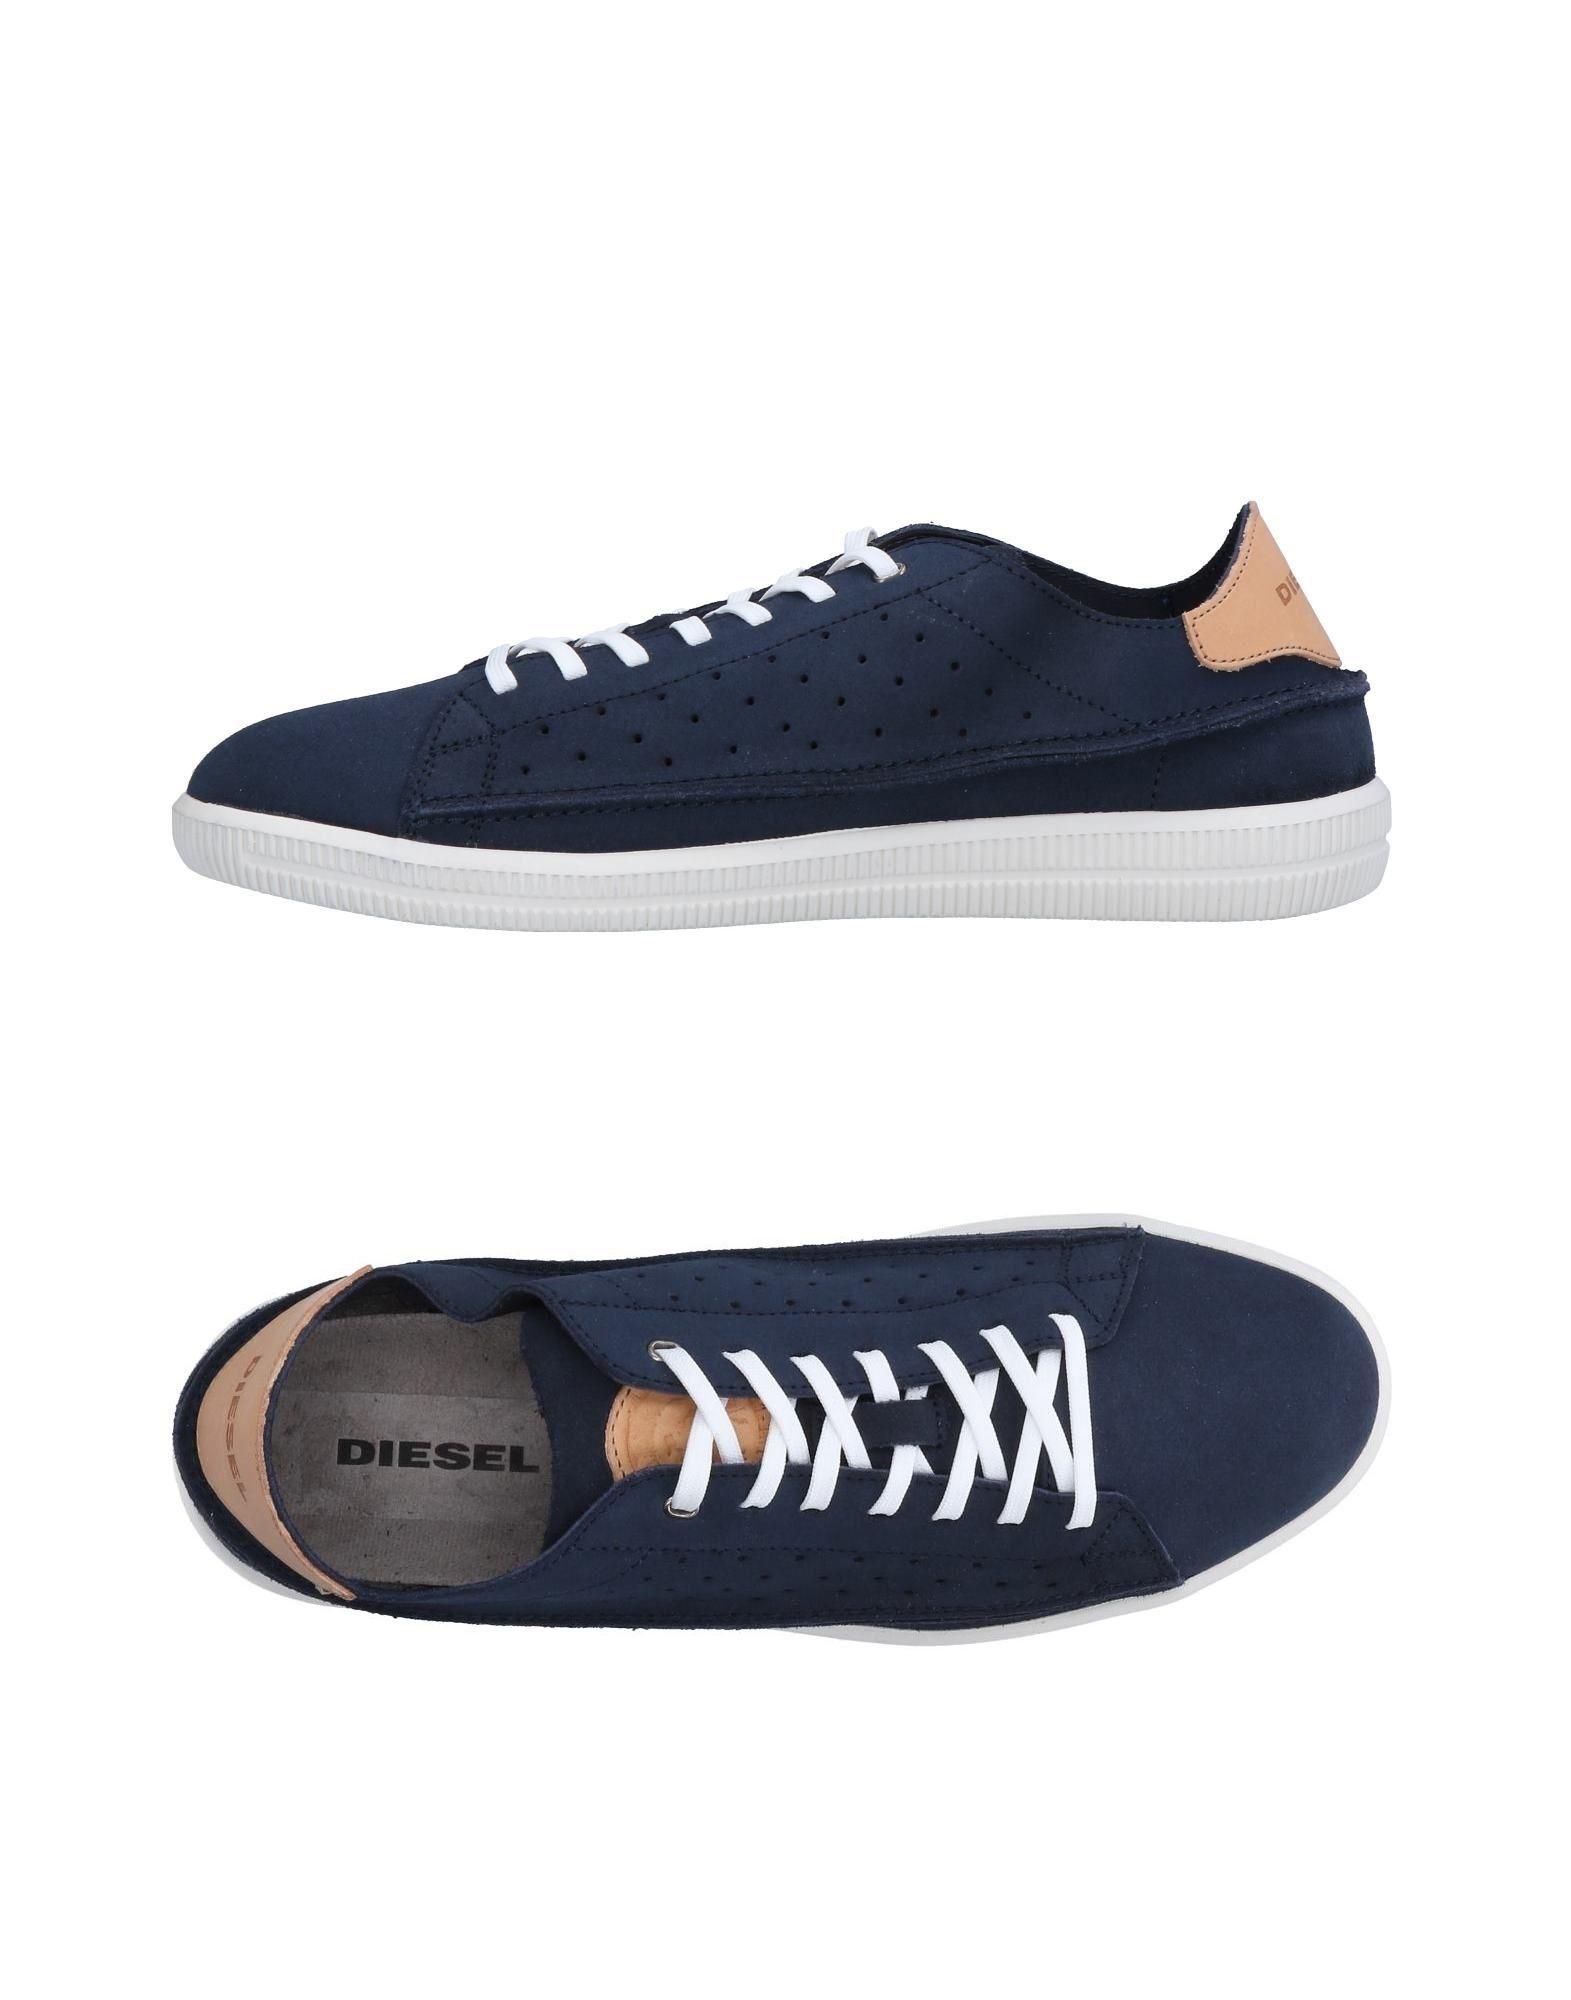 A buon mercato Sneakers Diesel Uomo - 11511888NB